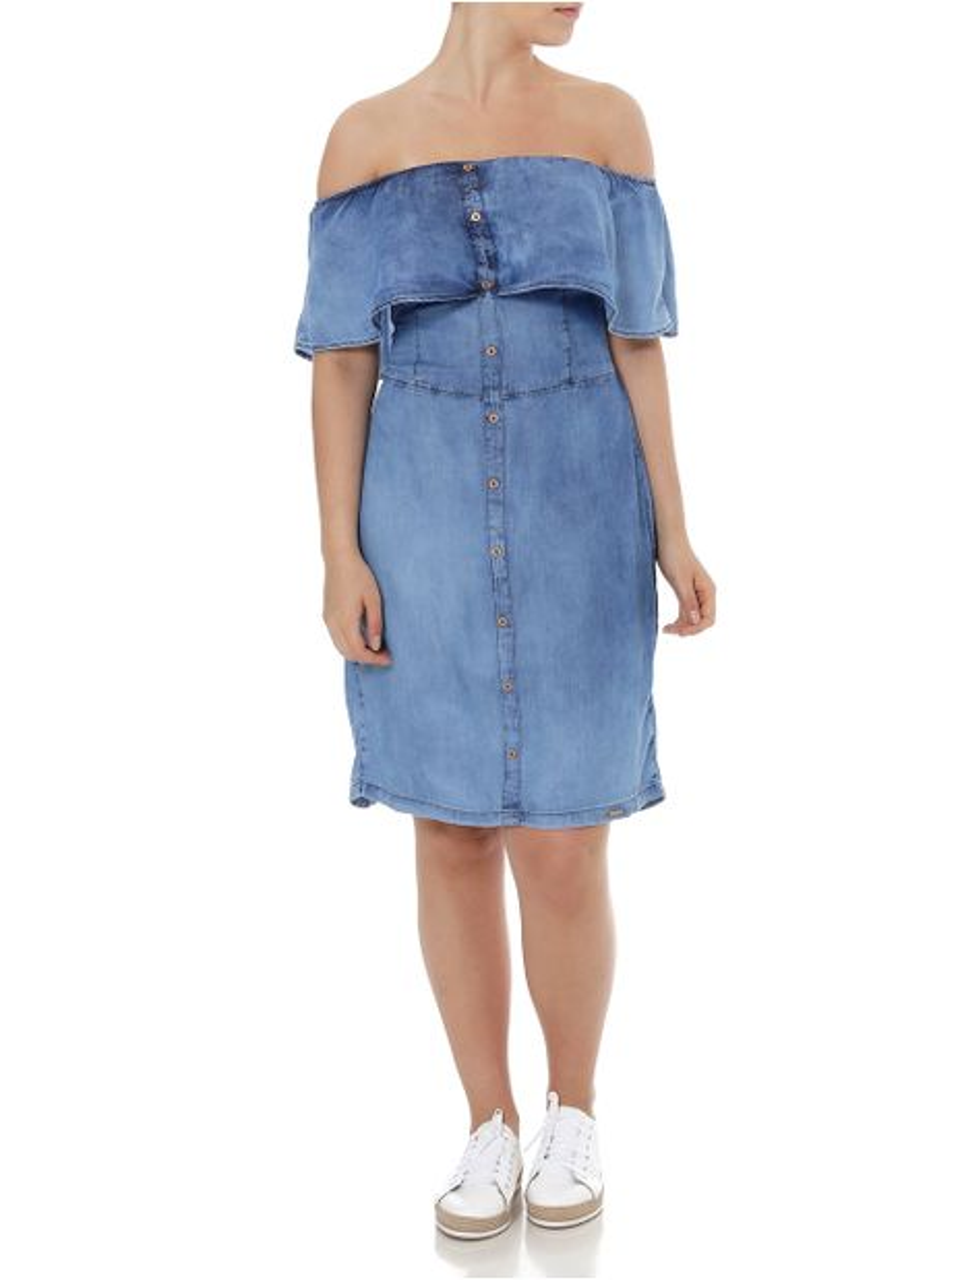 Vestido Ciganinha Jeans Feminino Azul